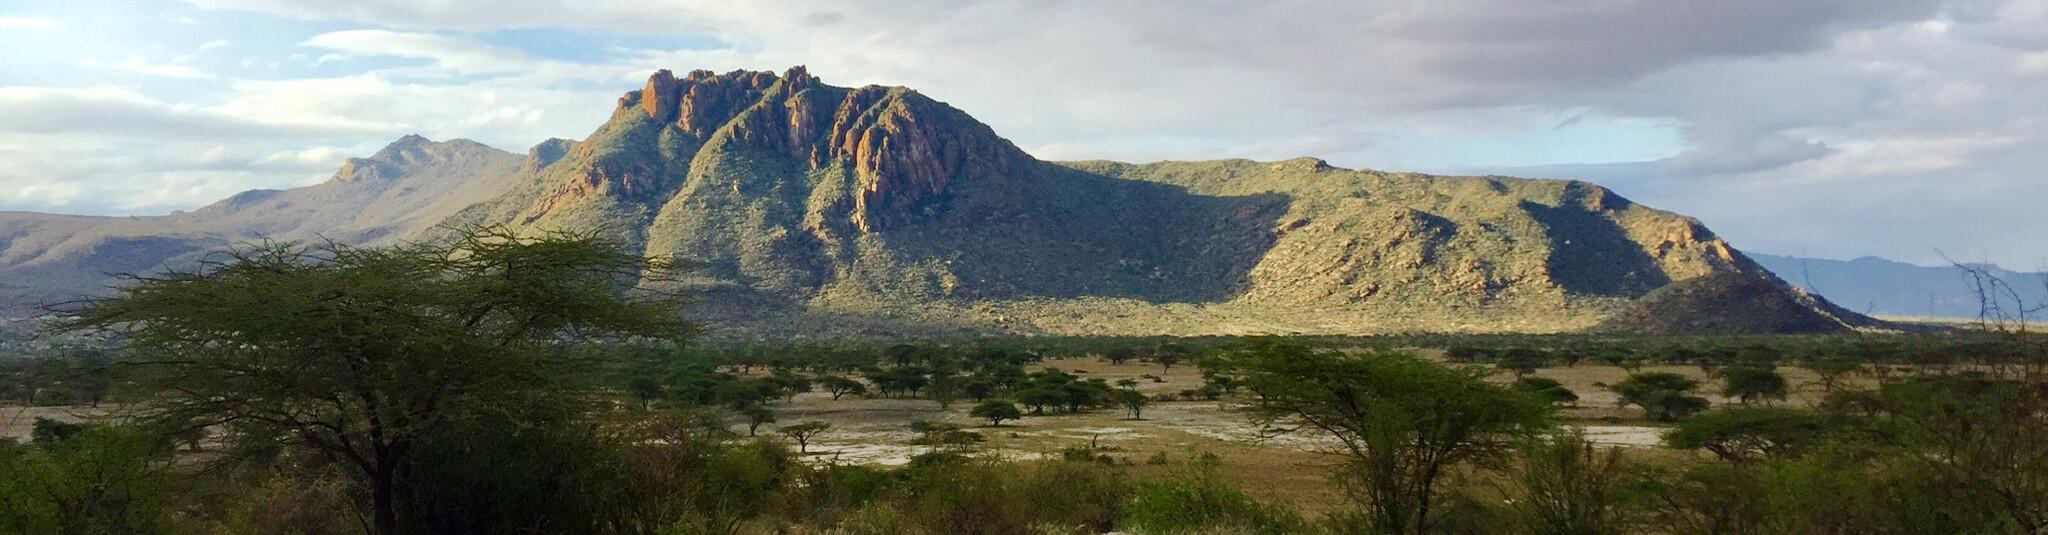 Kenia Reisebericht - Shaba National Reserve